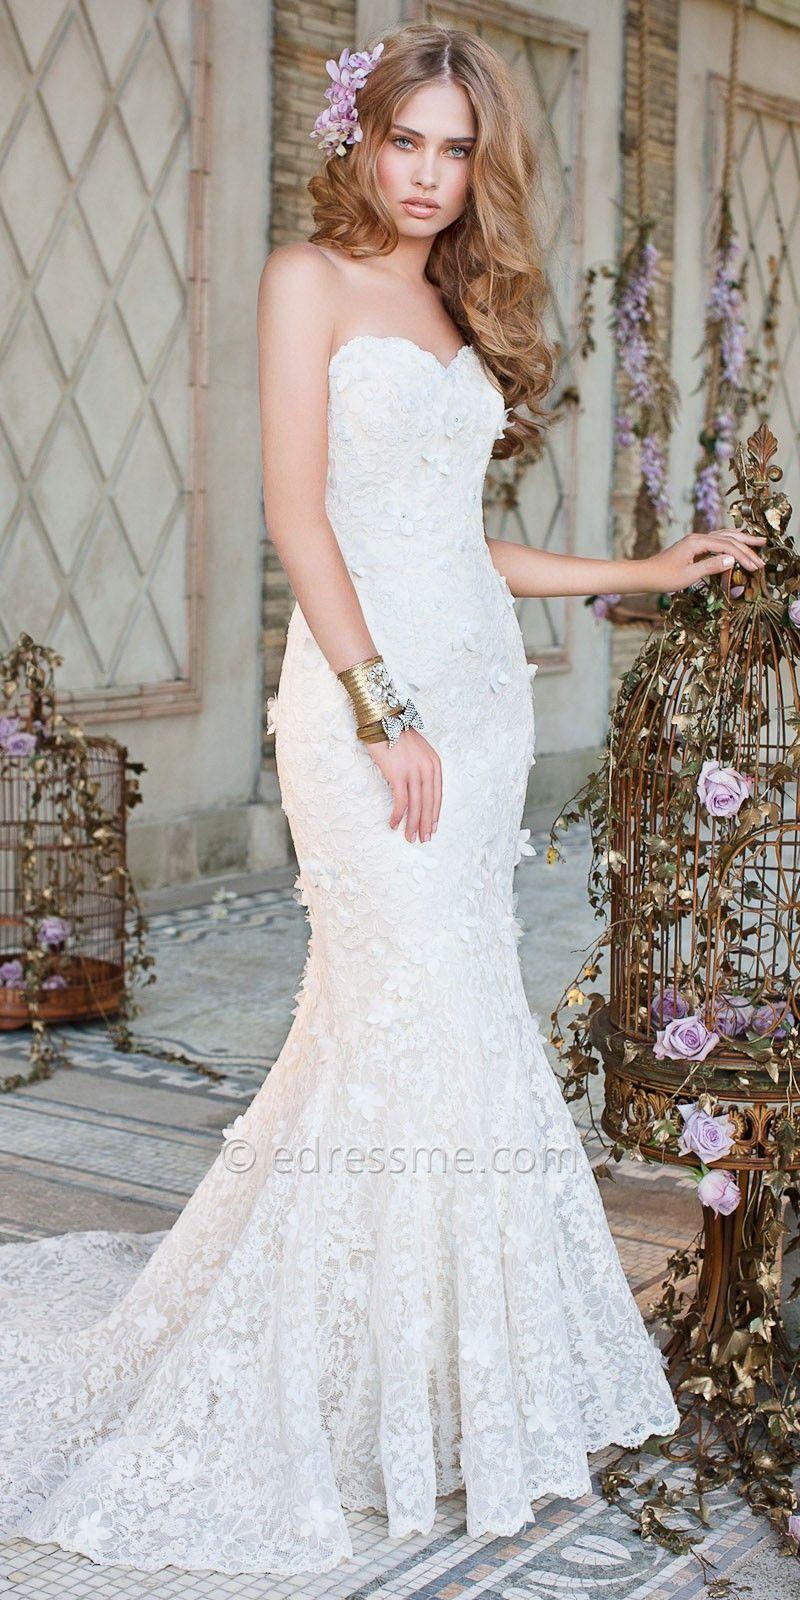 Strapless Lace Trumpet Wedding Dresses by Camille La Vie-image